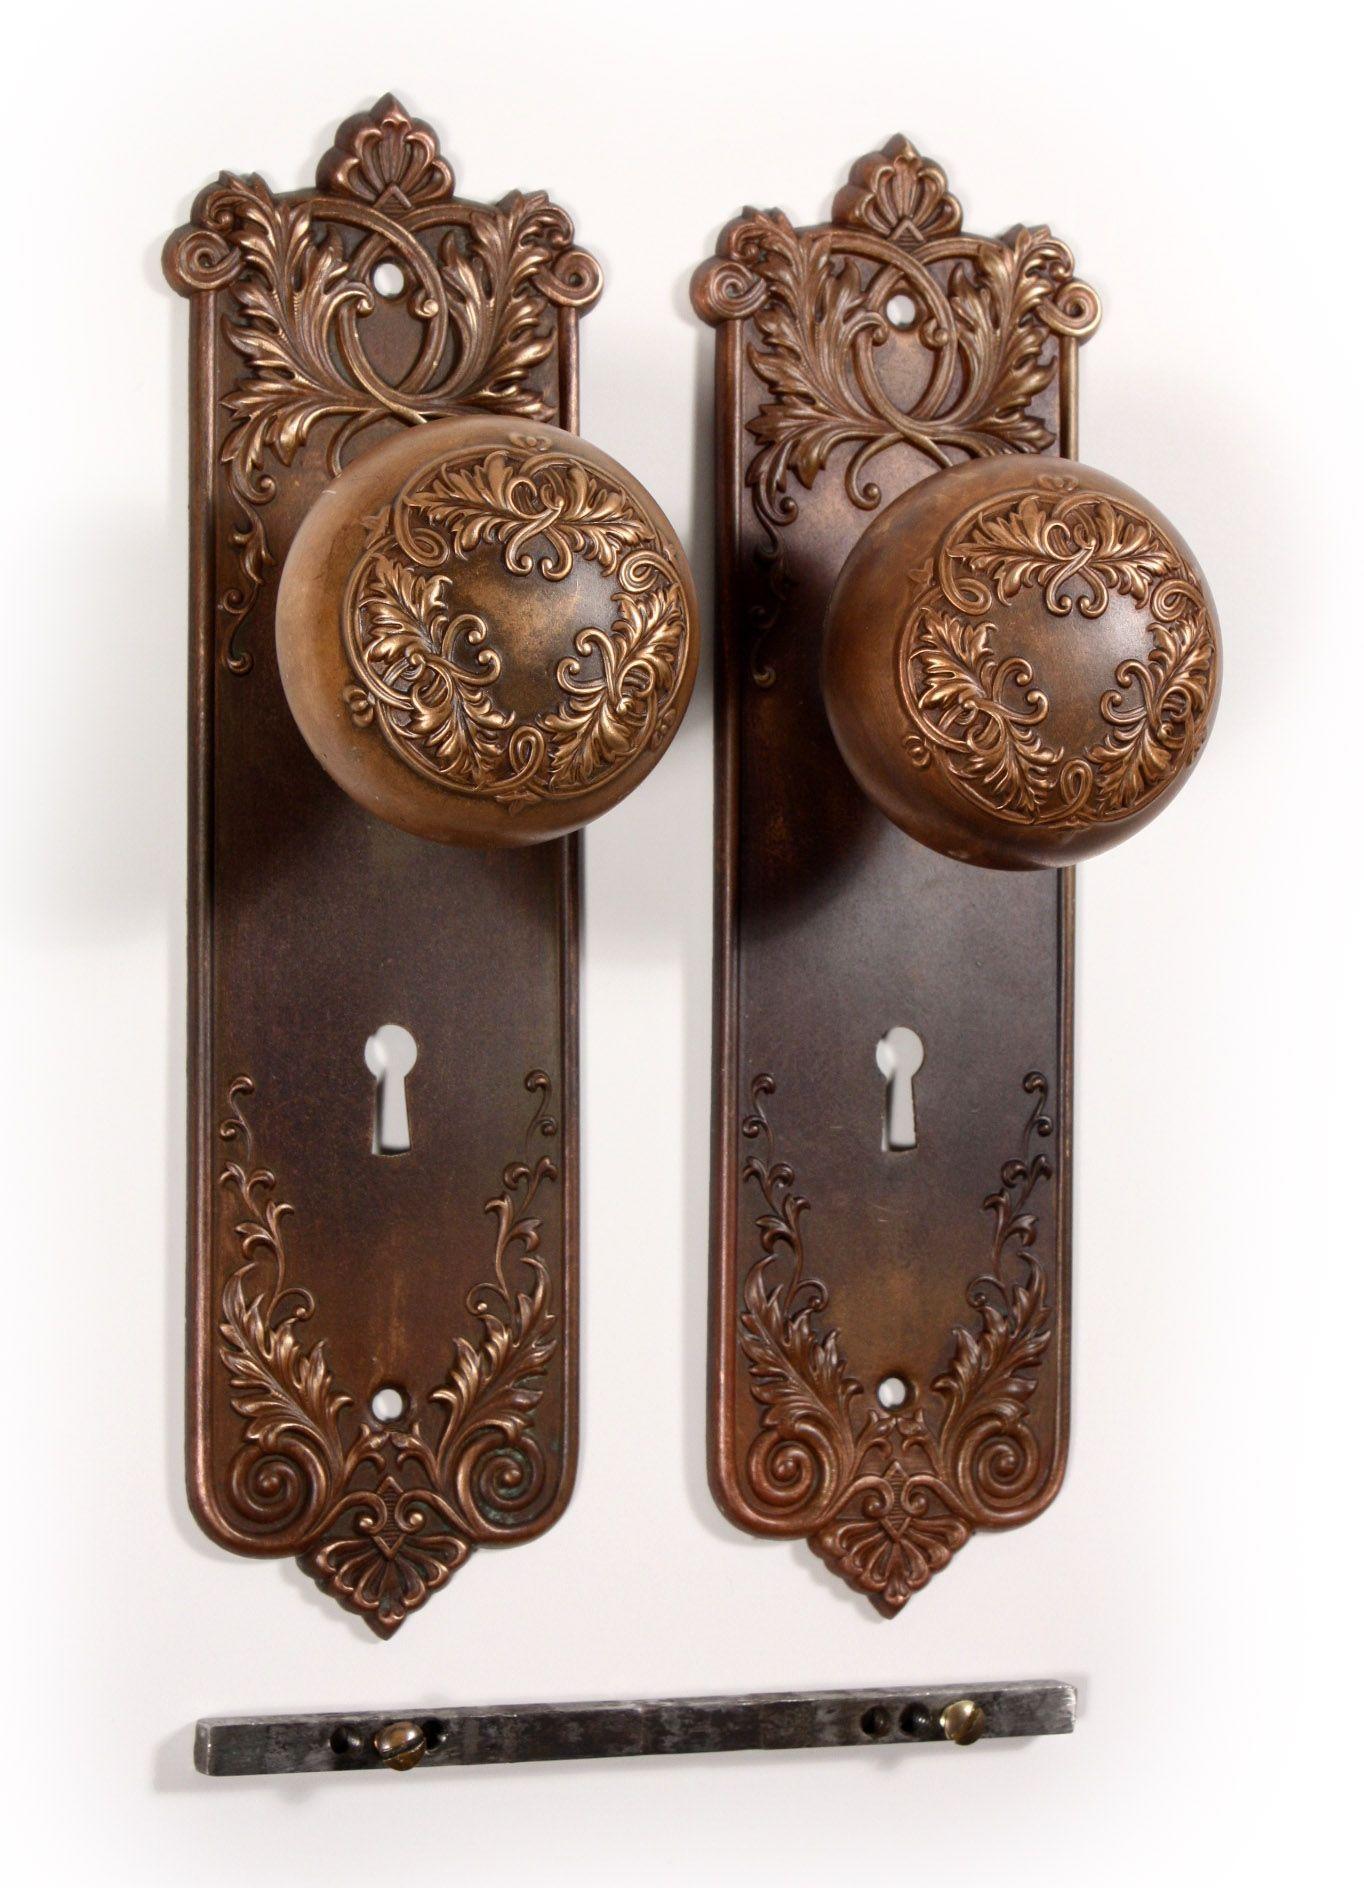 Vintage Door Knob Backplates Door Locks And Knobs for measurements 1364 X  1888 Vintage Backplates For Door Knobs - Doorknobs - Vintage Door Knob Backplates Door Locks And Knobs For Measurements